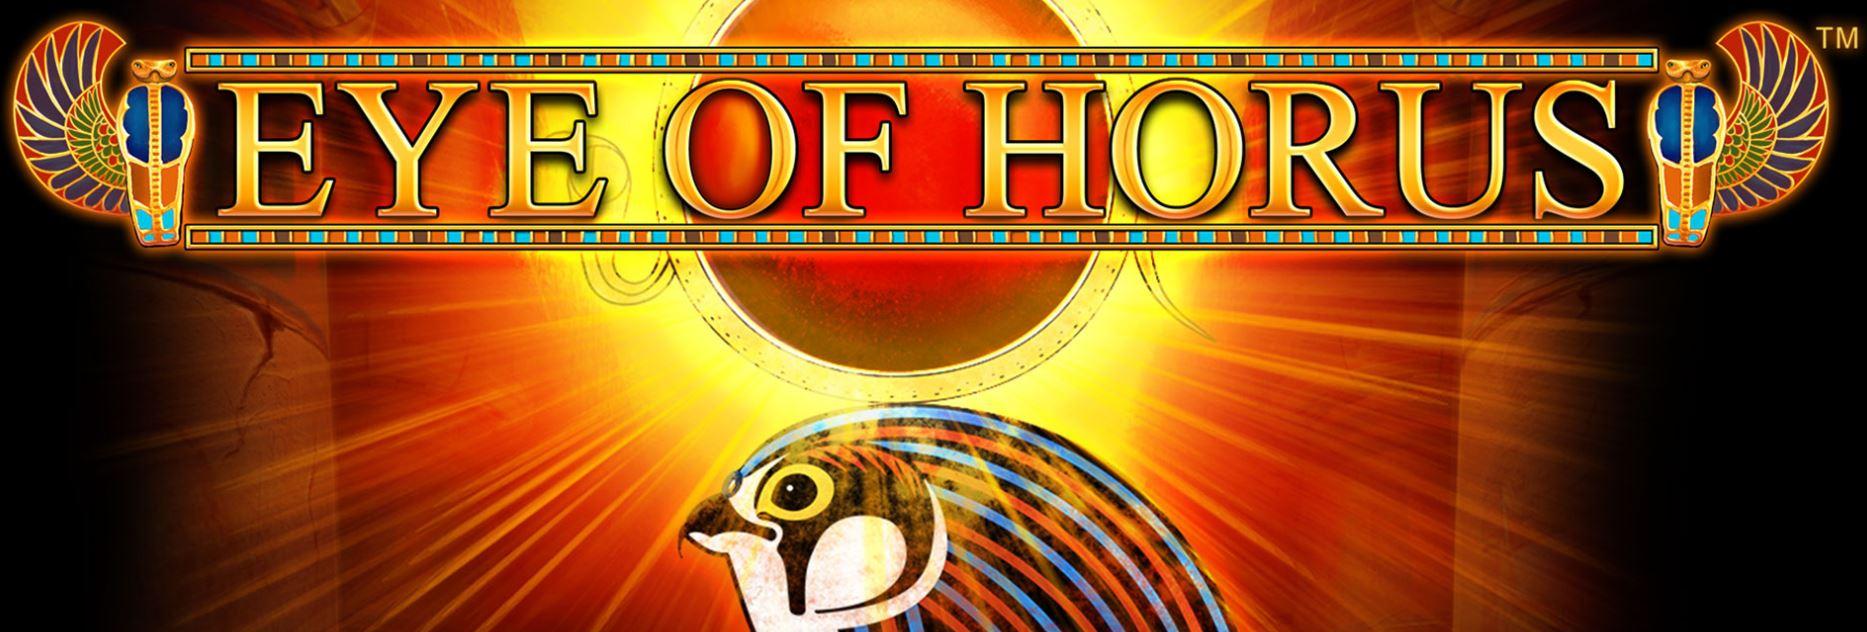 merkur gaming eye of horus